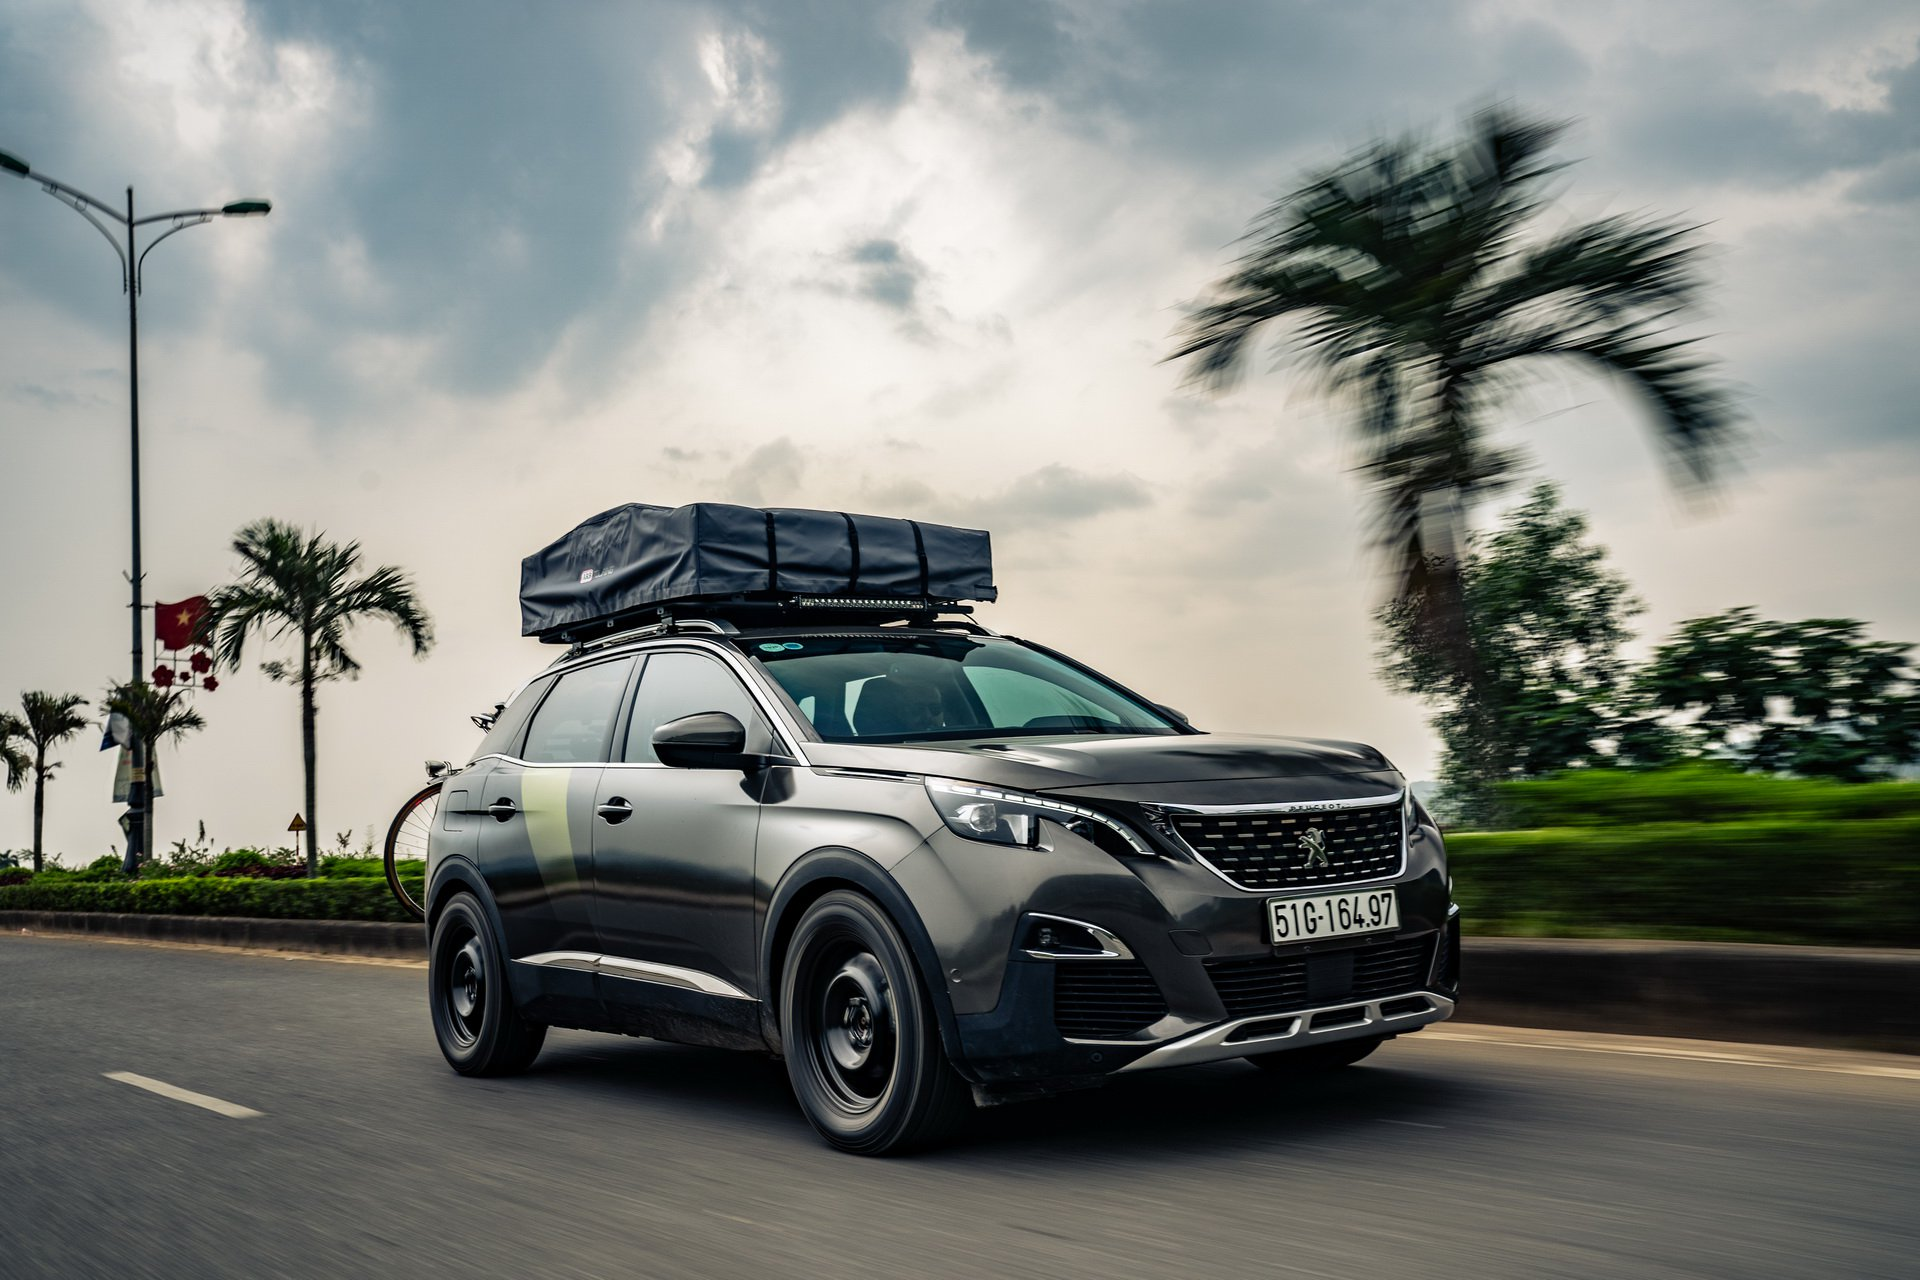 Peugeot-3008-Concept-Vietnam-Adventure-2